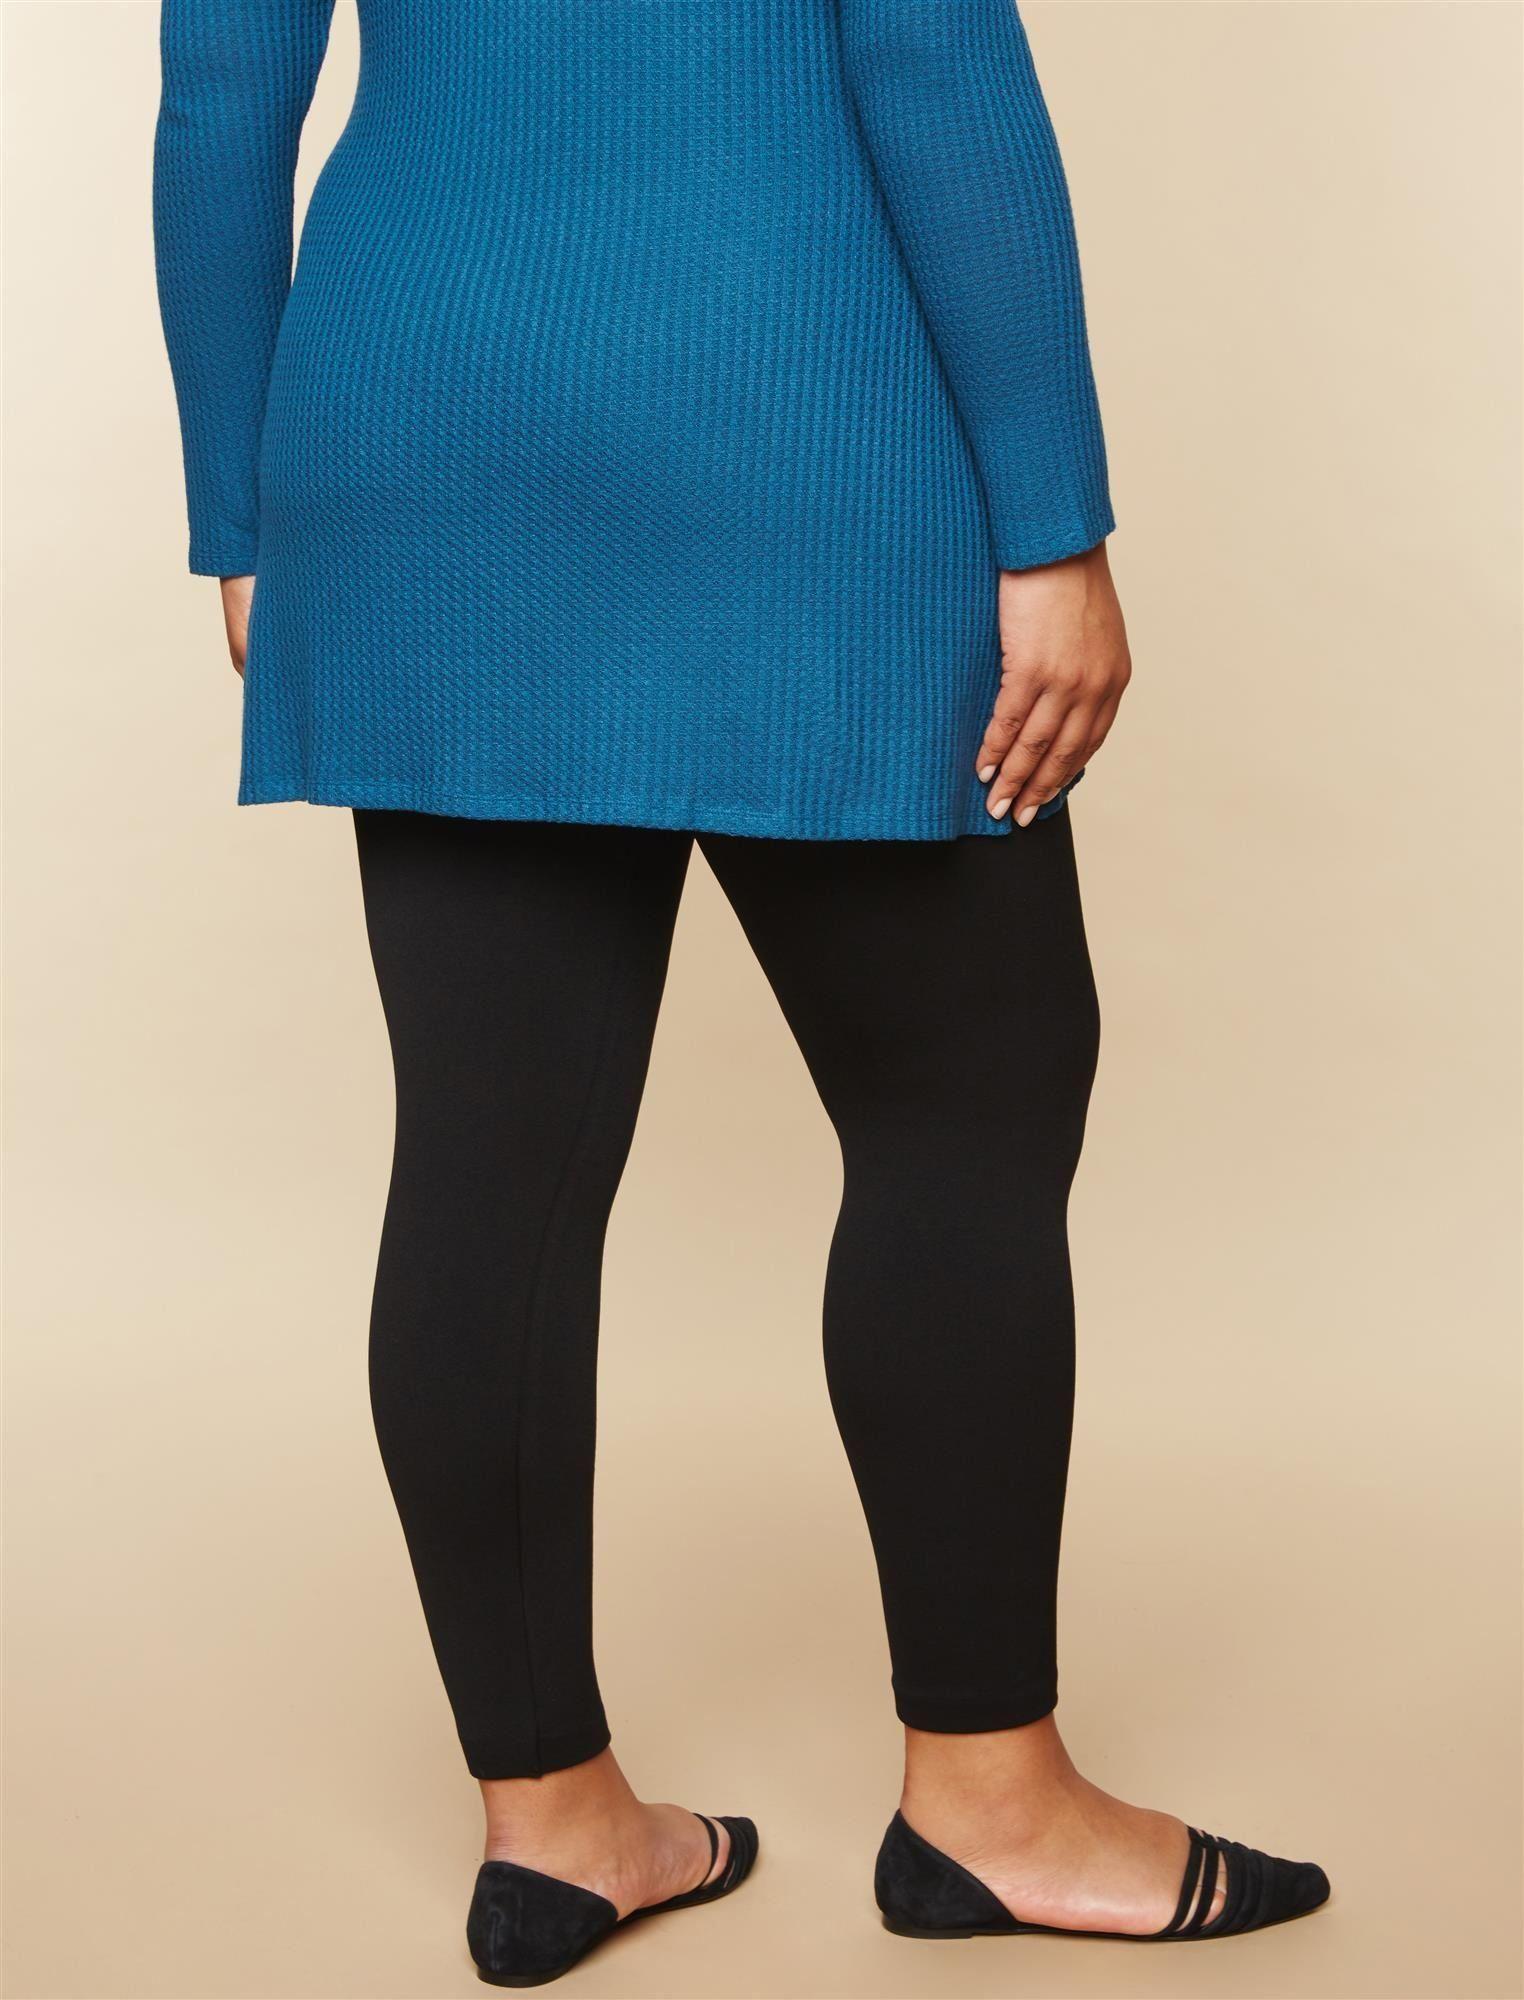 a293aef2e864a Maternity Outfits - dressy maternity leggings : Motherhood Maternity Womens  Maternity PlusSize Full Length Fleece Lined Seamless Leggings Black 1X **  Click ...